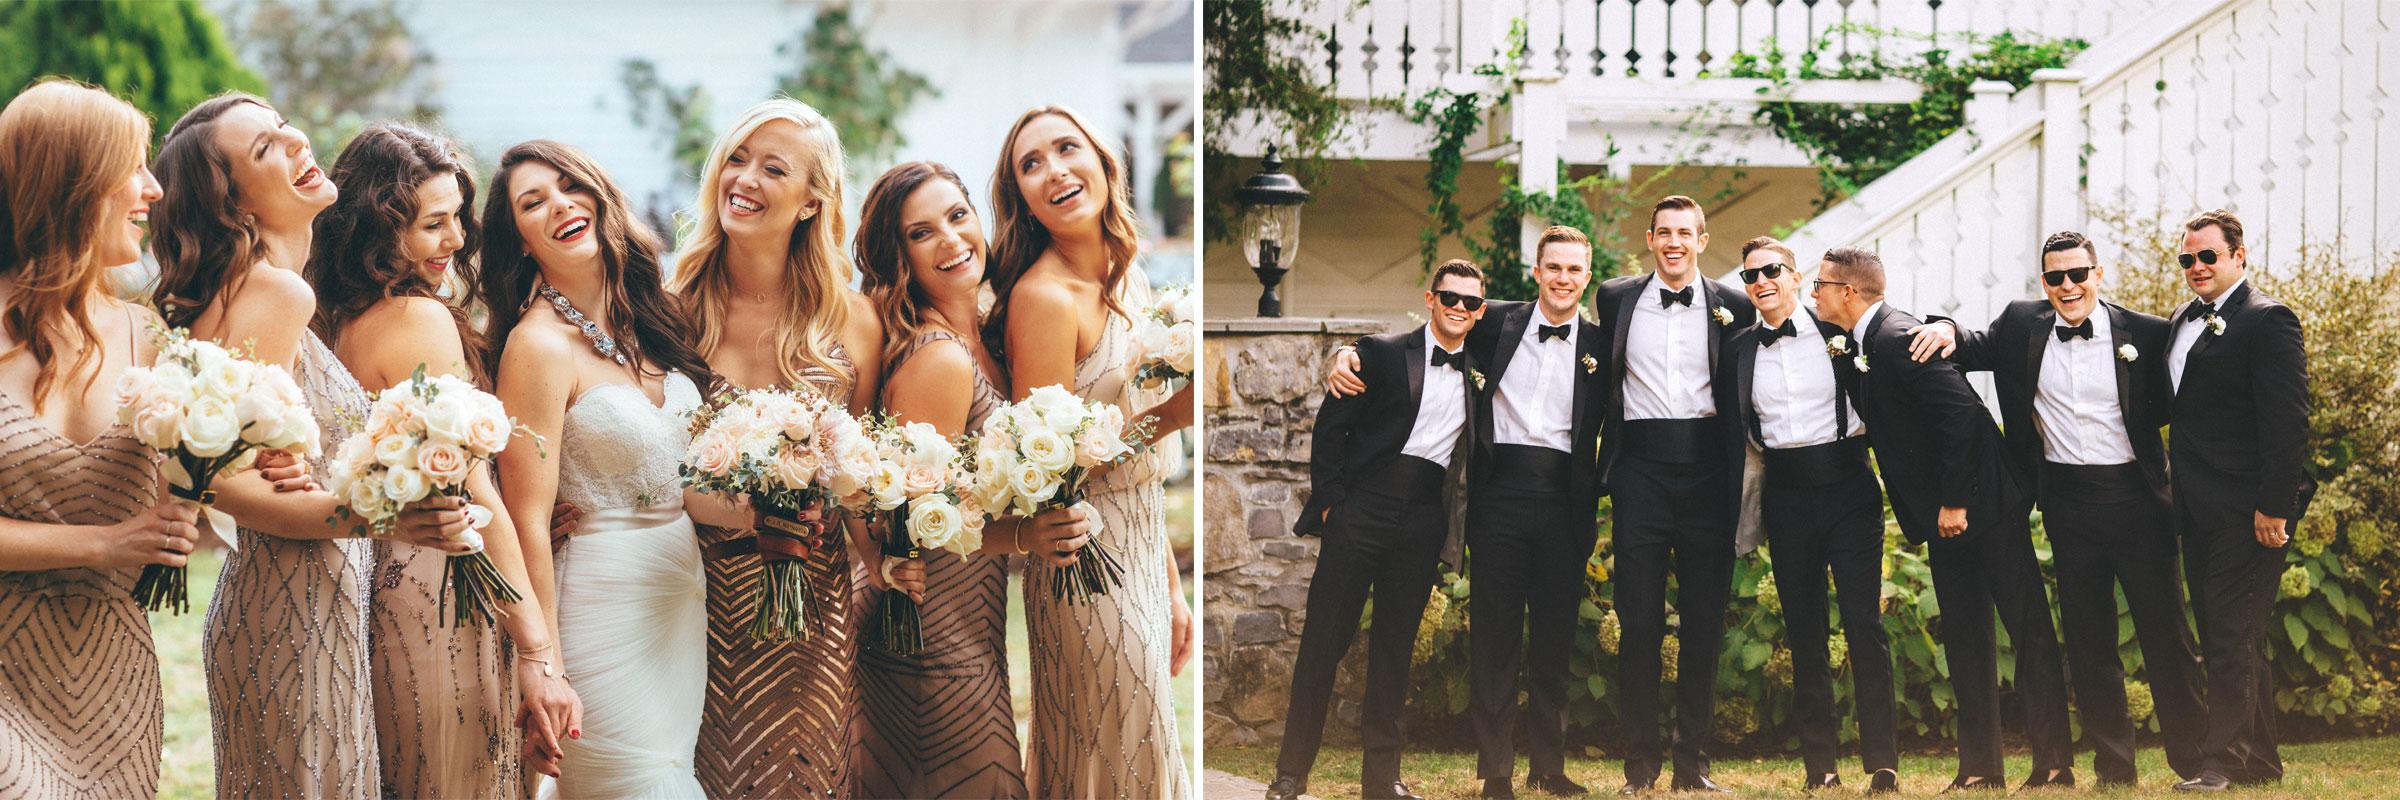 Me & Mr. Jones Wedding, Black Tie Wedding, Bridesmaids wearing Adrianna Papell Beaded Dresses, Embellished Bridesmaids Dresses, Black Tie Wedding, Blush Bridesmaids, Black Tuxedos